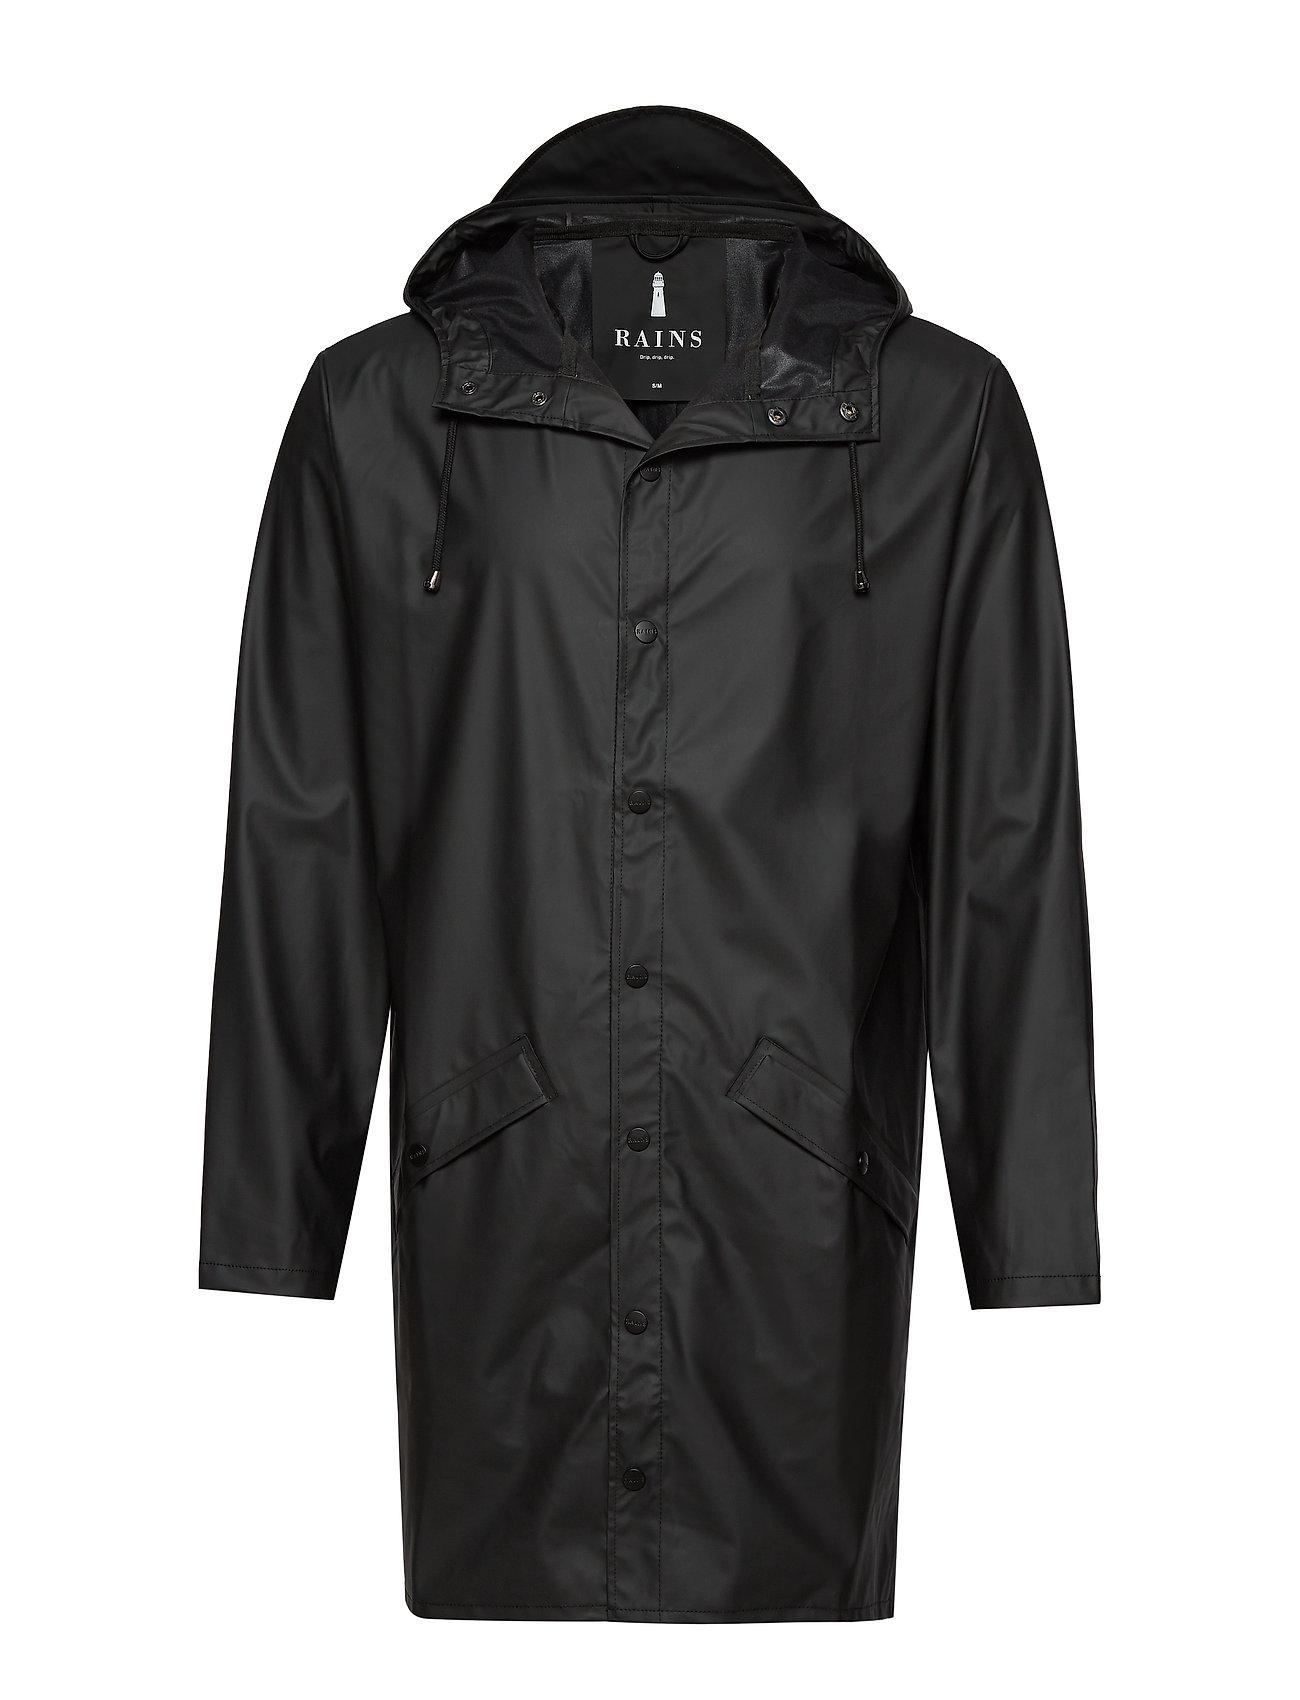 Rains Long Jacket - 01 BLACK